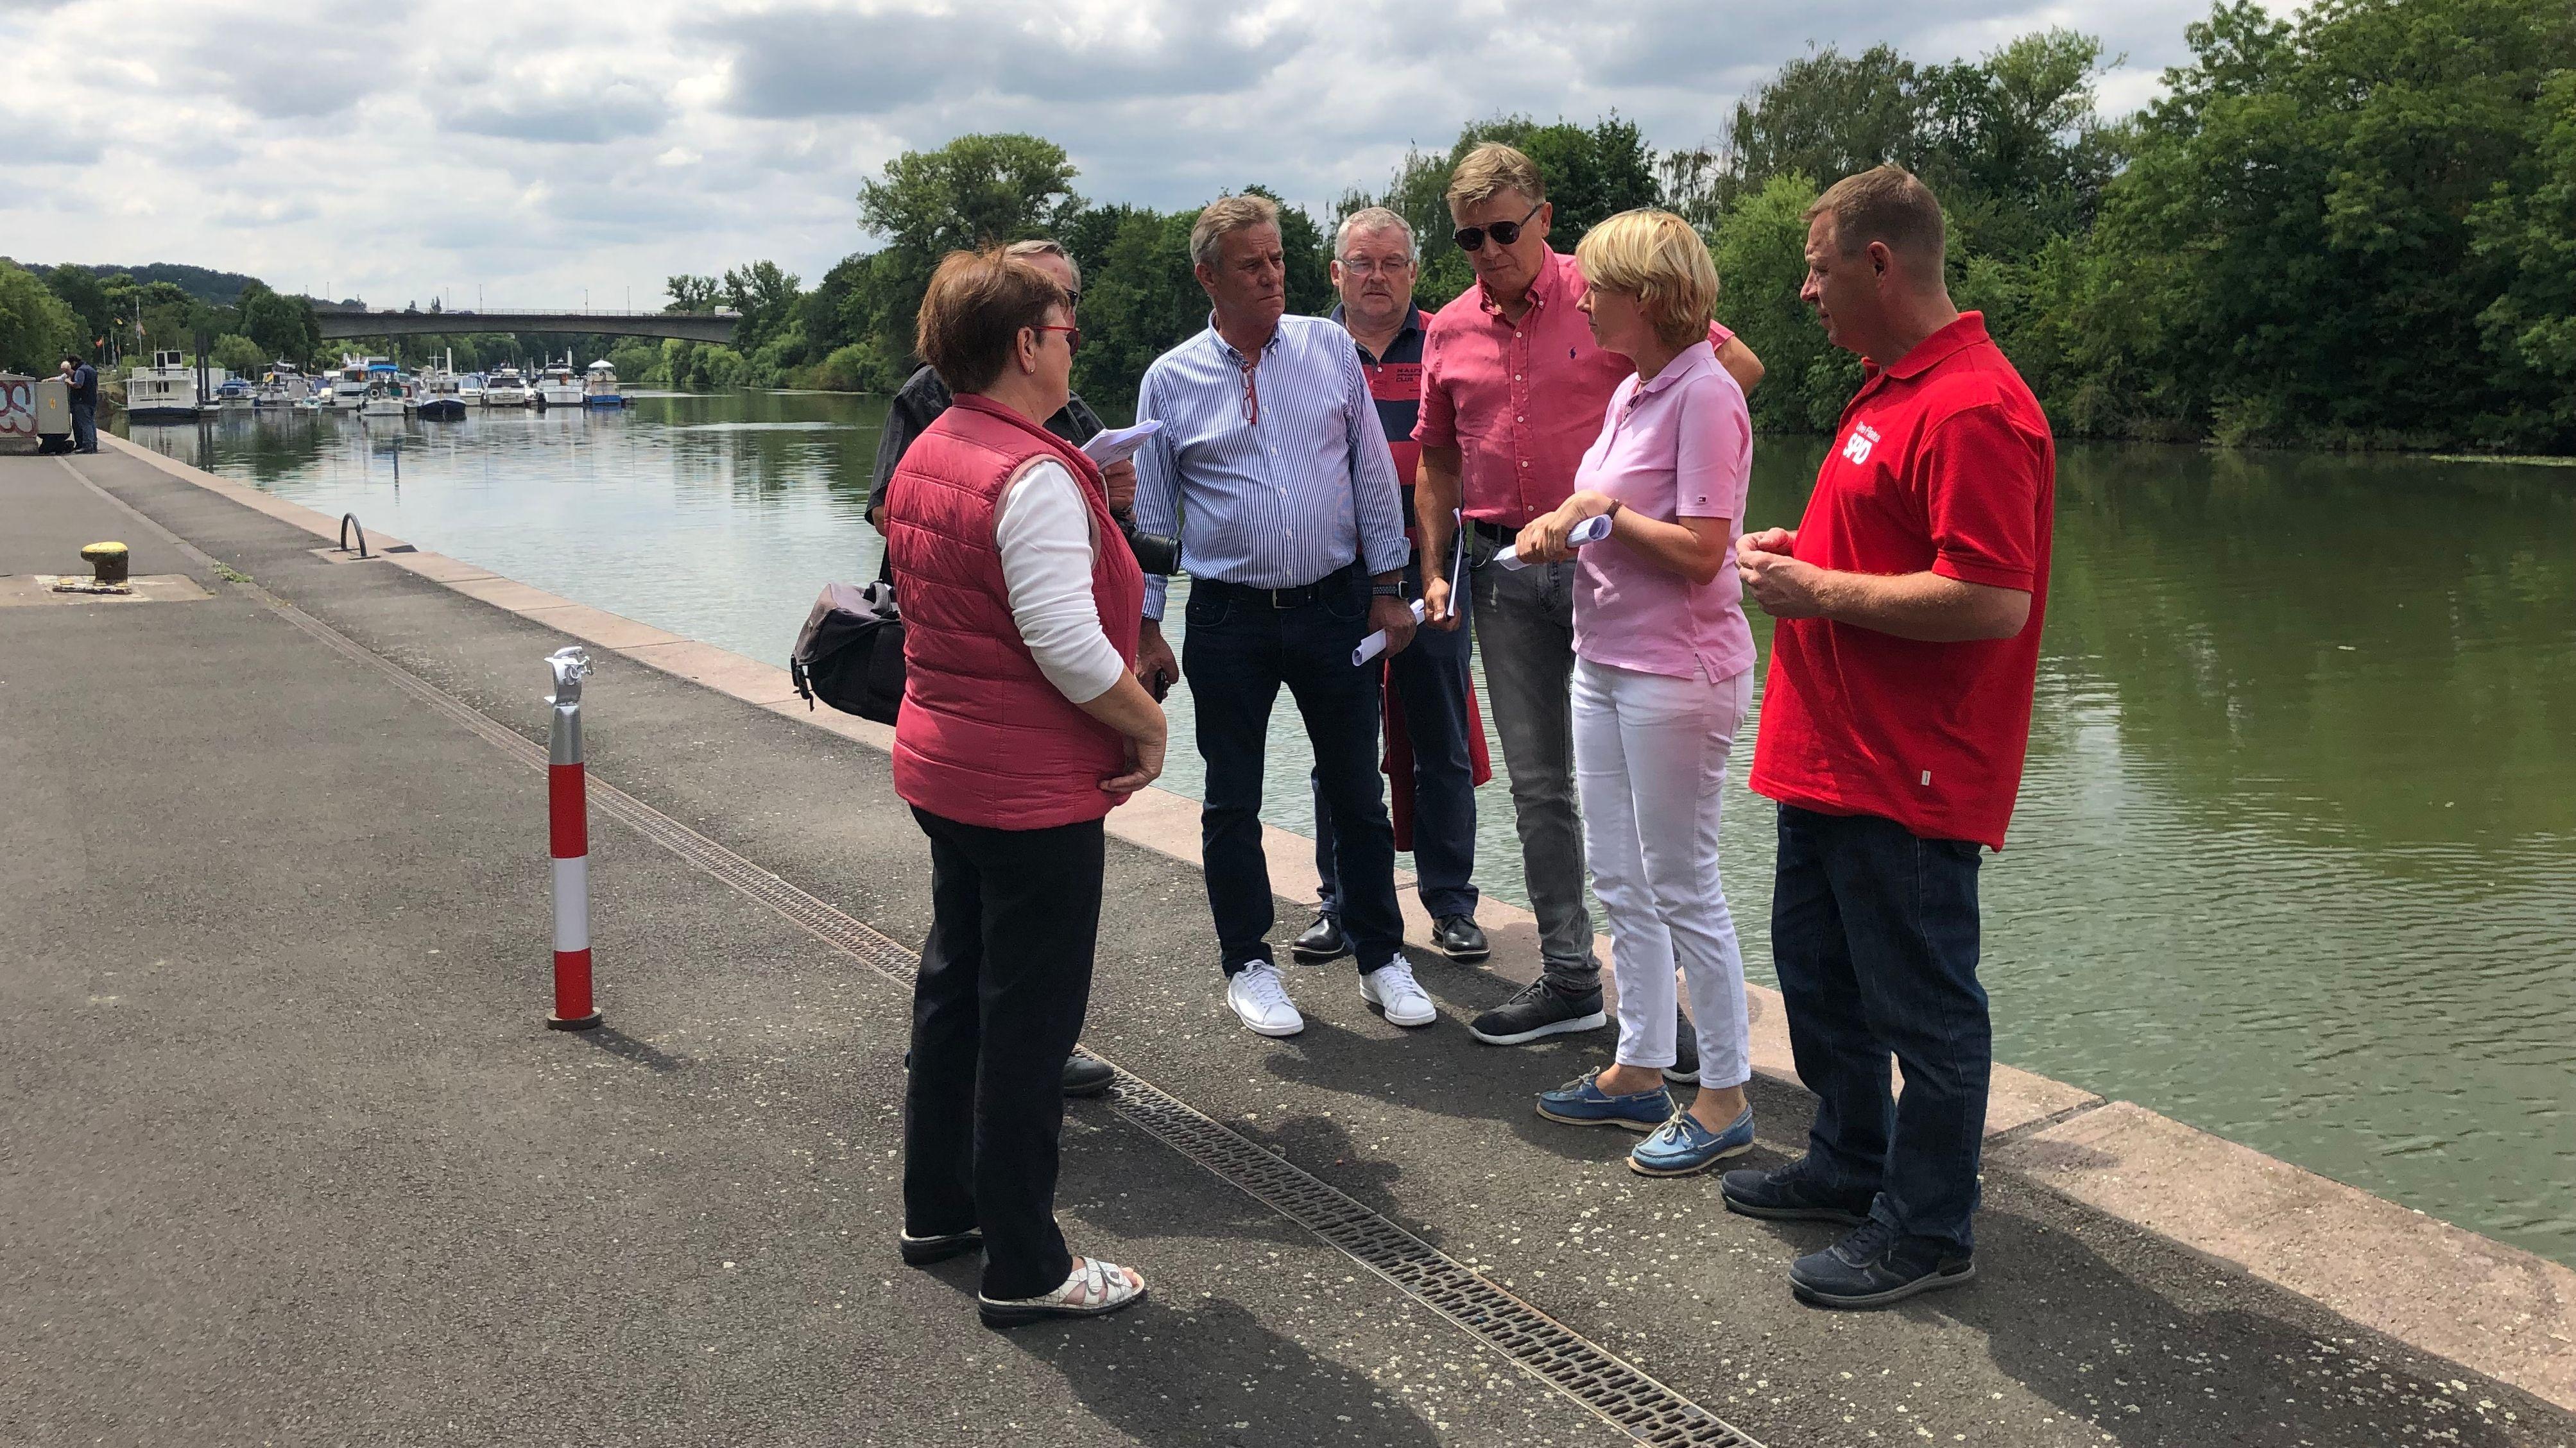 Aschaffenburger Stadträte besichtigen das Mainufer im Aschaffenburger Floßhafen.